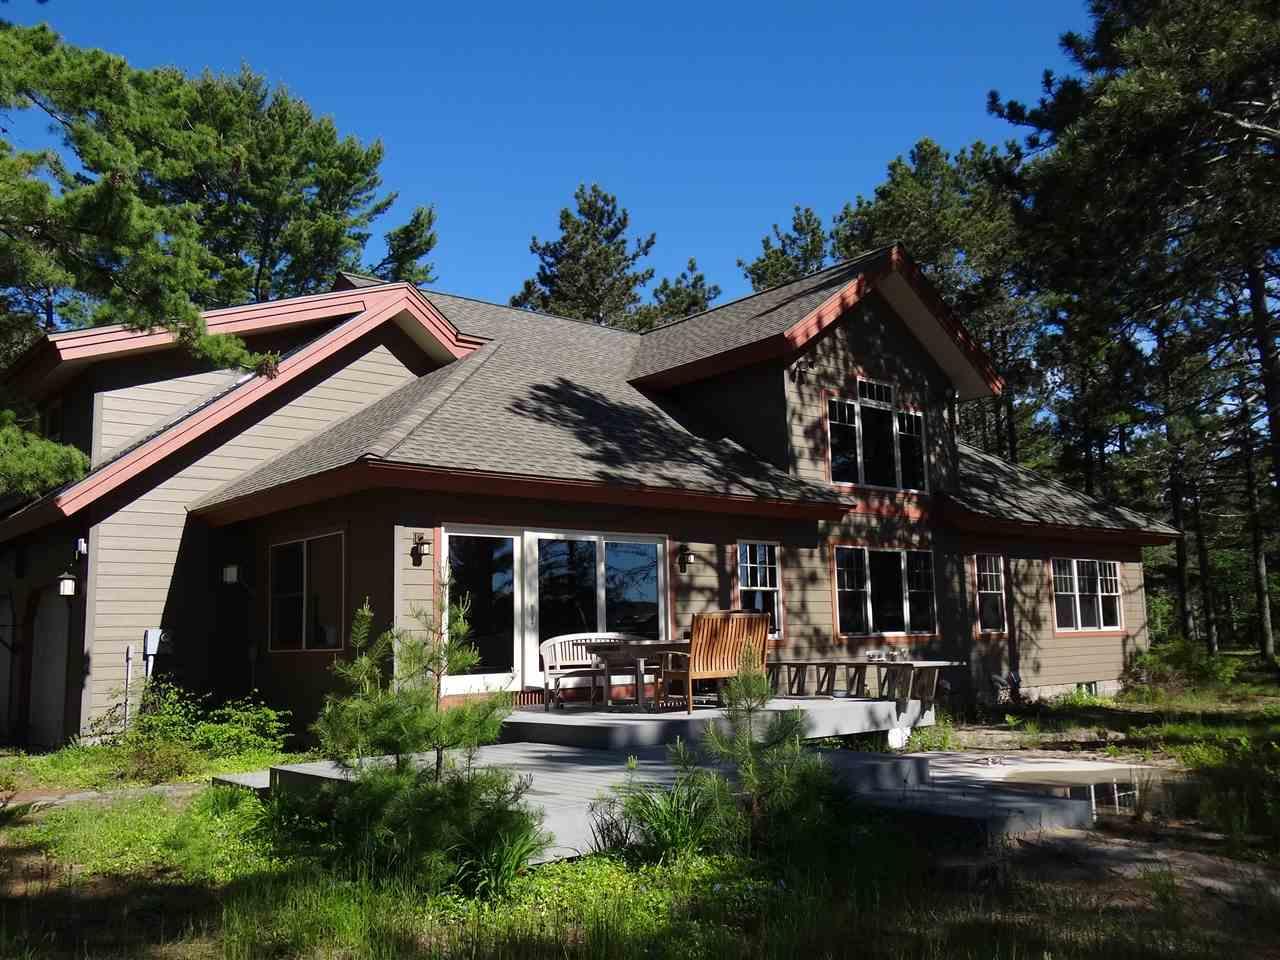 Michigan keweenaw county allouez - Type Residential County Keweenaw